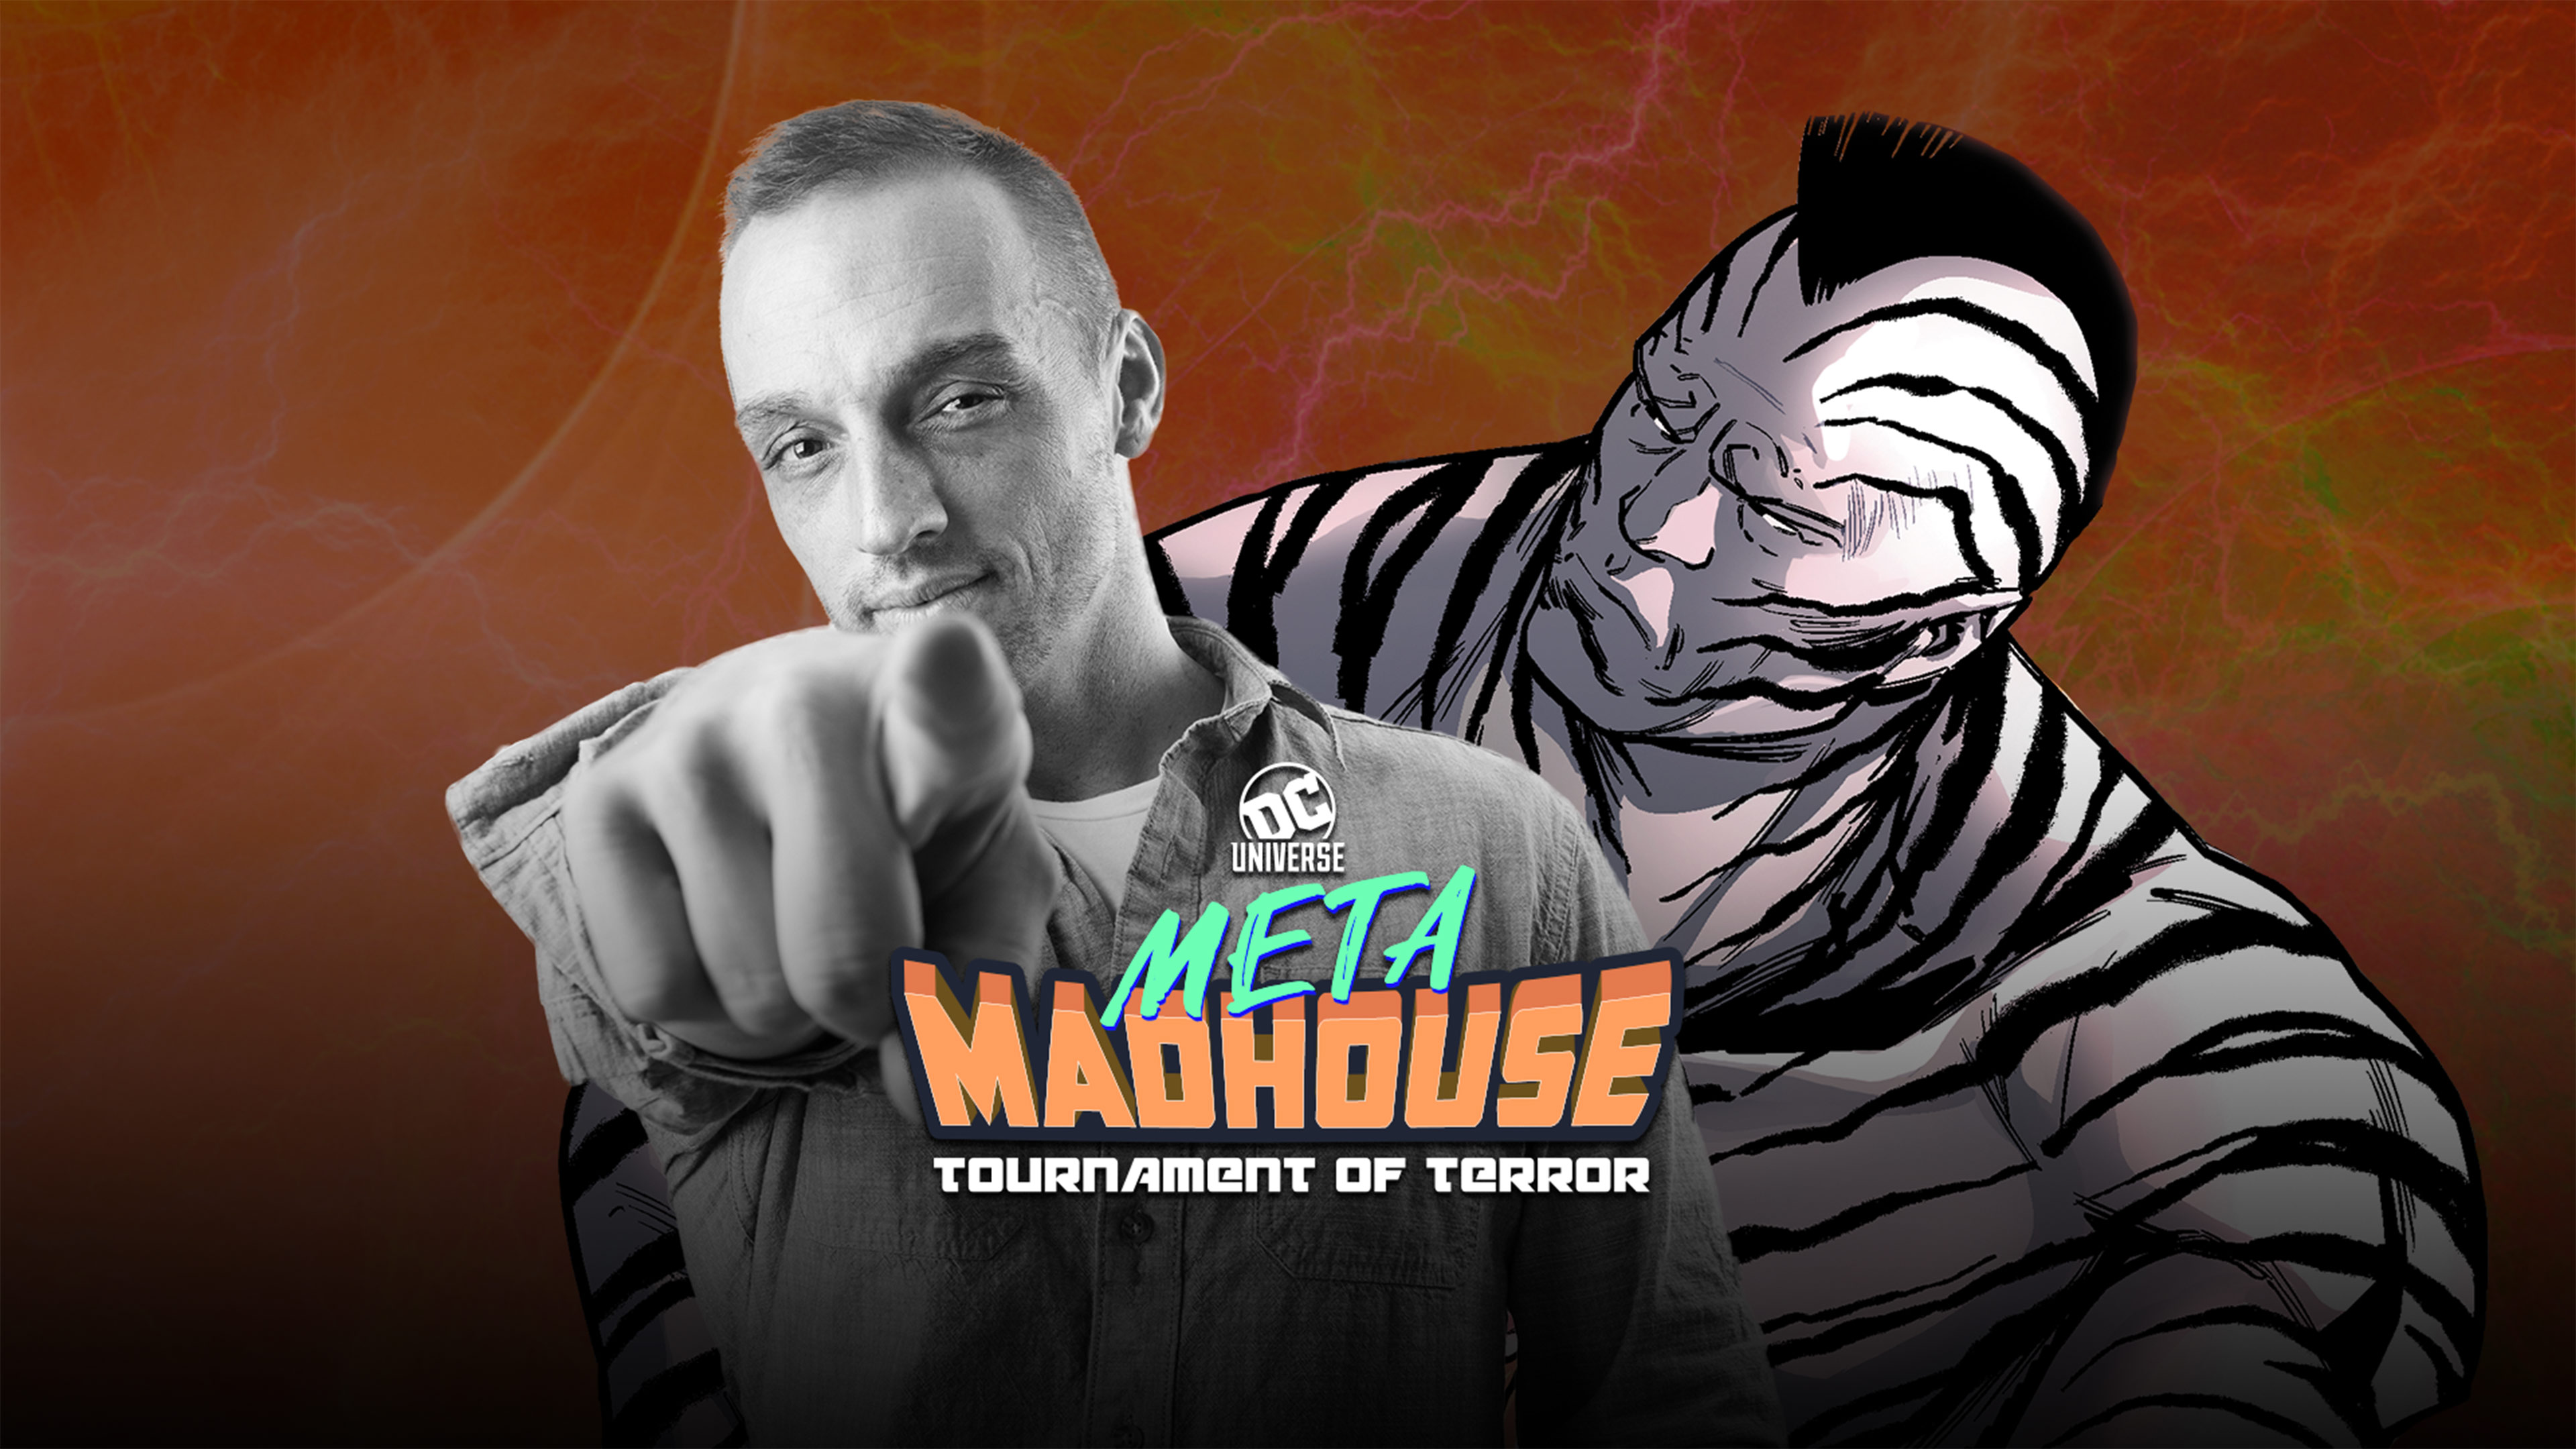 Phil + Zebraman lazarus pit save_metamadhouse_news_hero-c_v2_200327.jpg